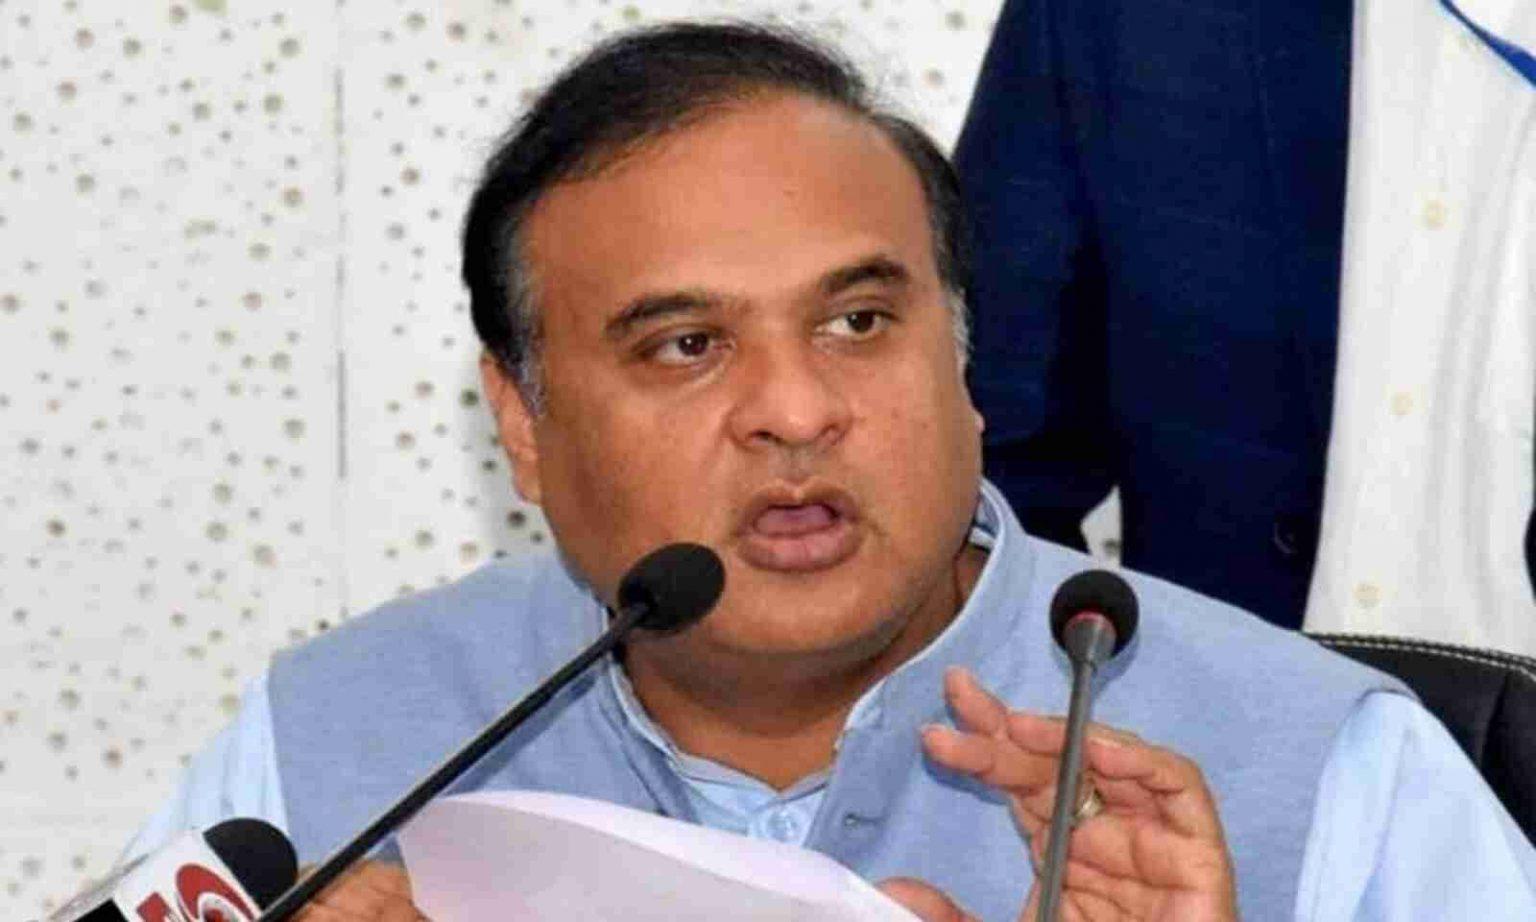 Assam to create new department for indigenous faith and culture | సంస్కృతి మరియు సంప్రదాయాలకై ఒక స్వతంత్ర విభాగాన్ని ఏర్పాటు చేస్తున్నట్లు అస్సాం ప్రభుత్వం ప్రకటించింది |_40.1